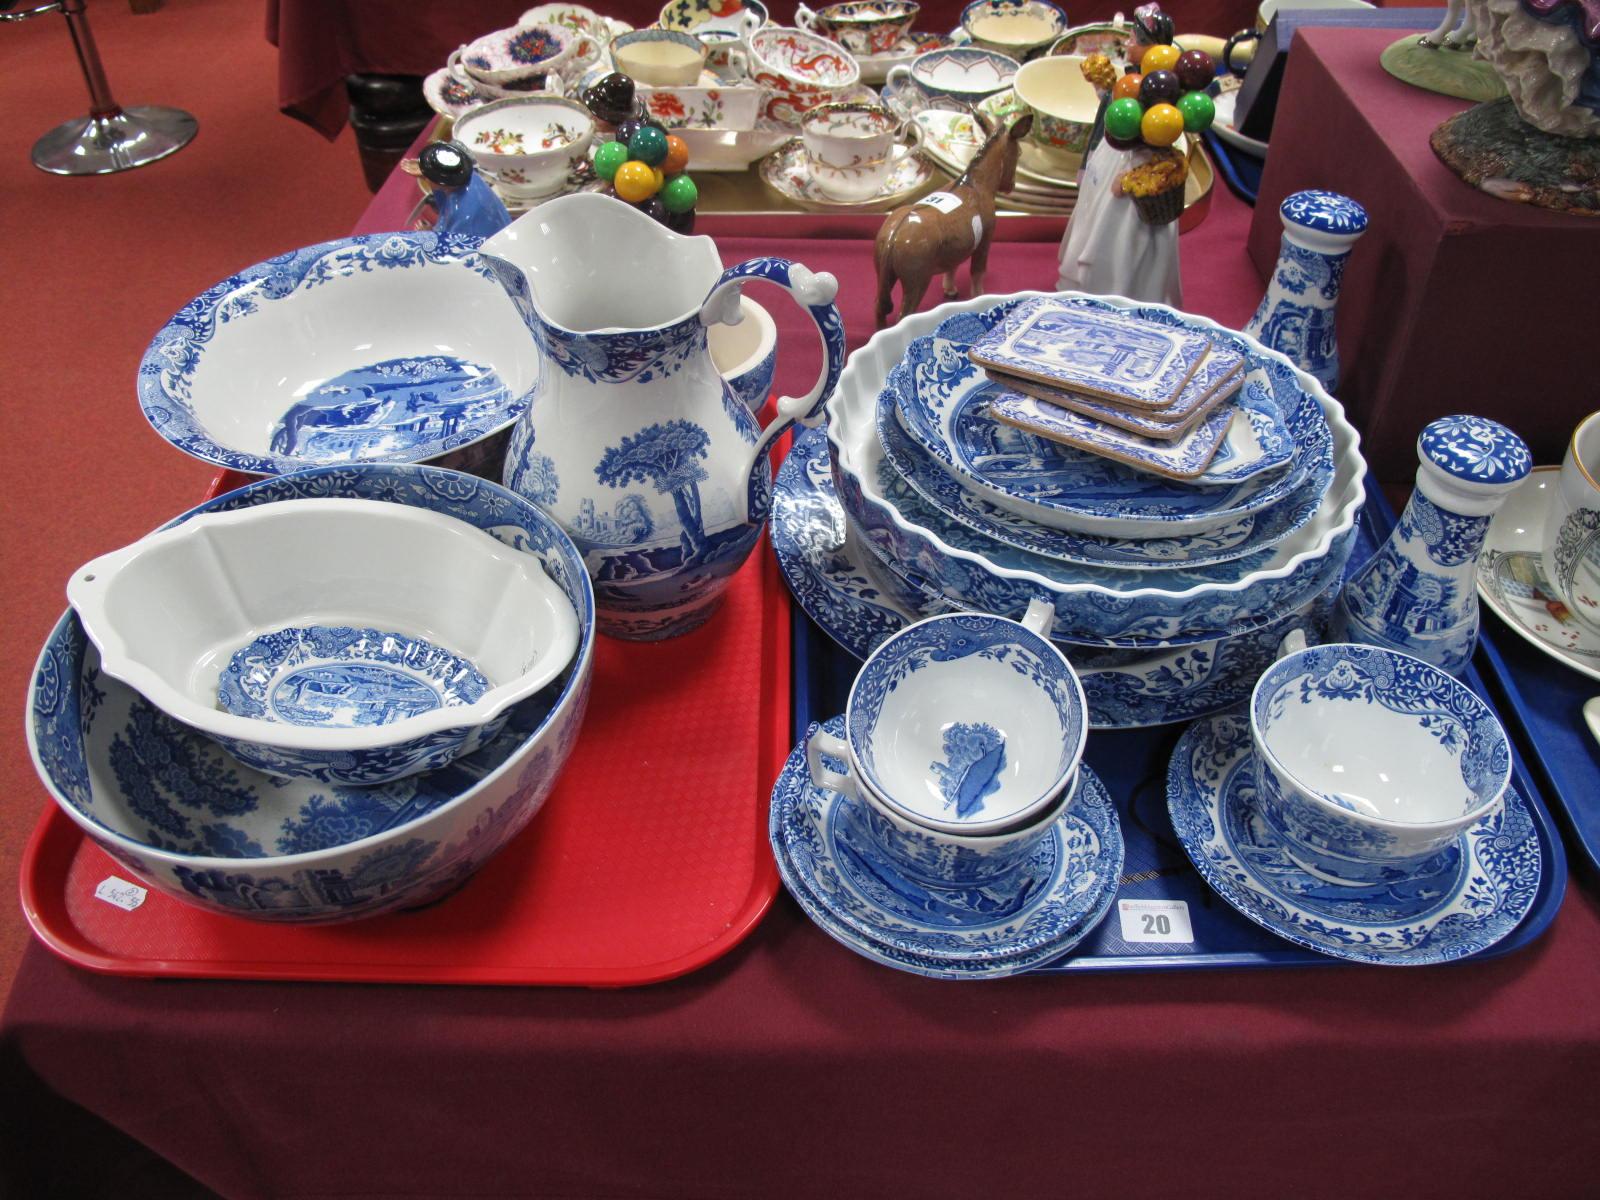 Lot 20 - Copeland Italian Spode Black Stamp Bowls, jug, salt and pepper pots, flan dish, plates, mortar and